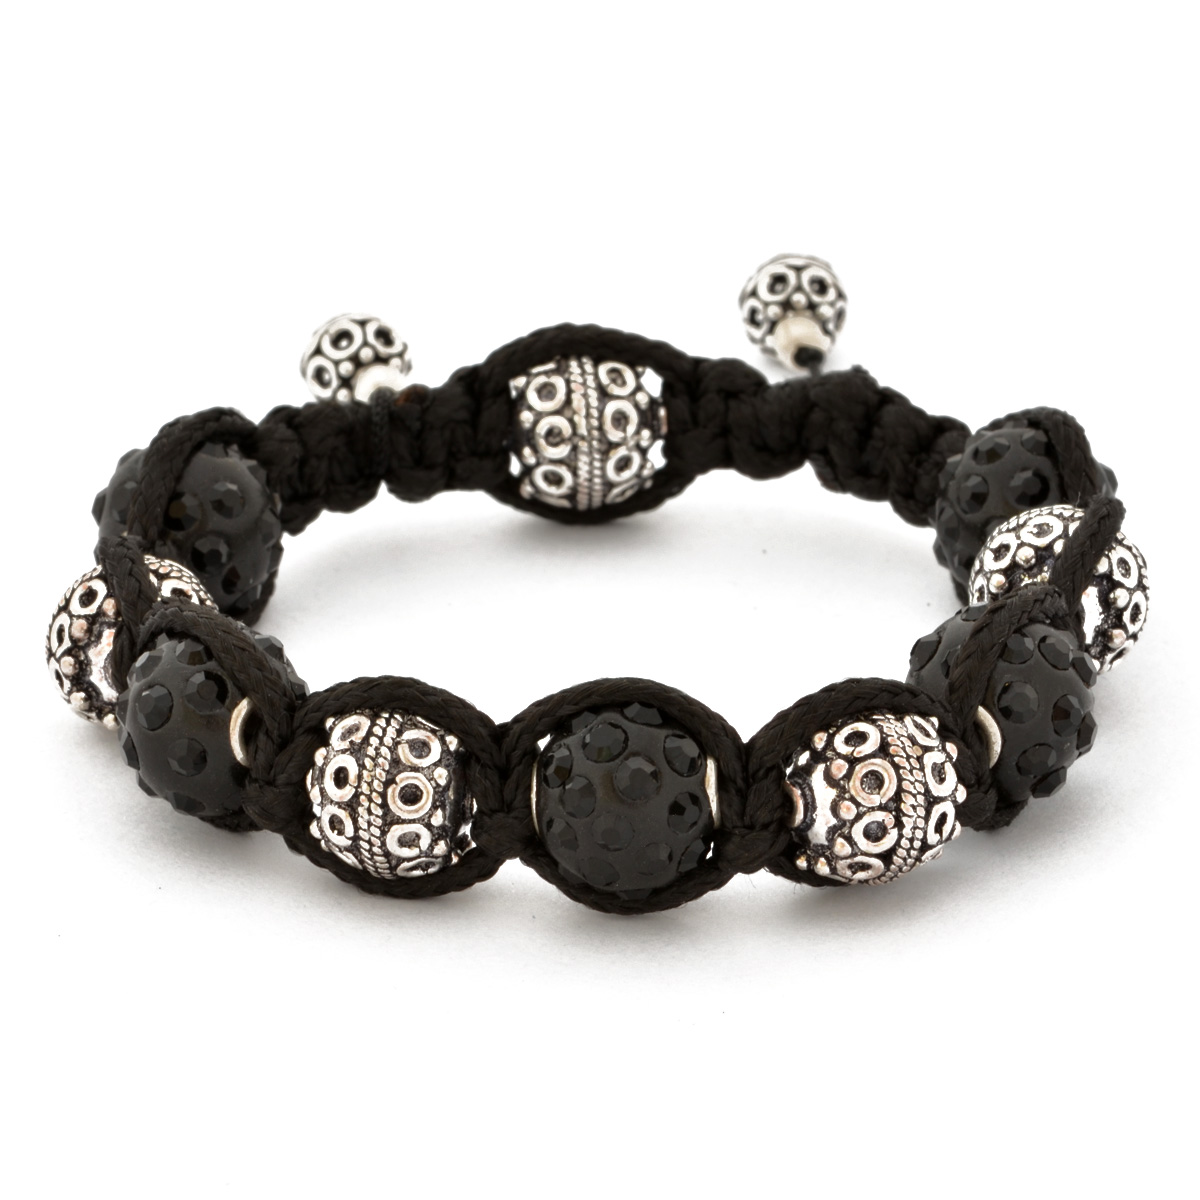 Gemstone Shamballa Bracelet Shamballa Bracelet With Black